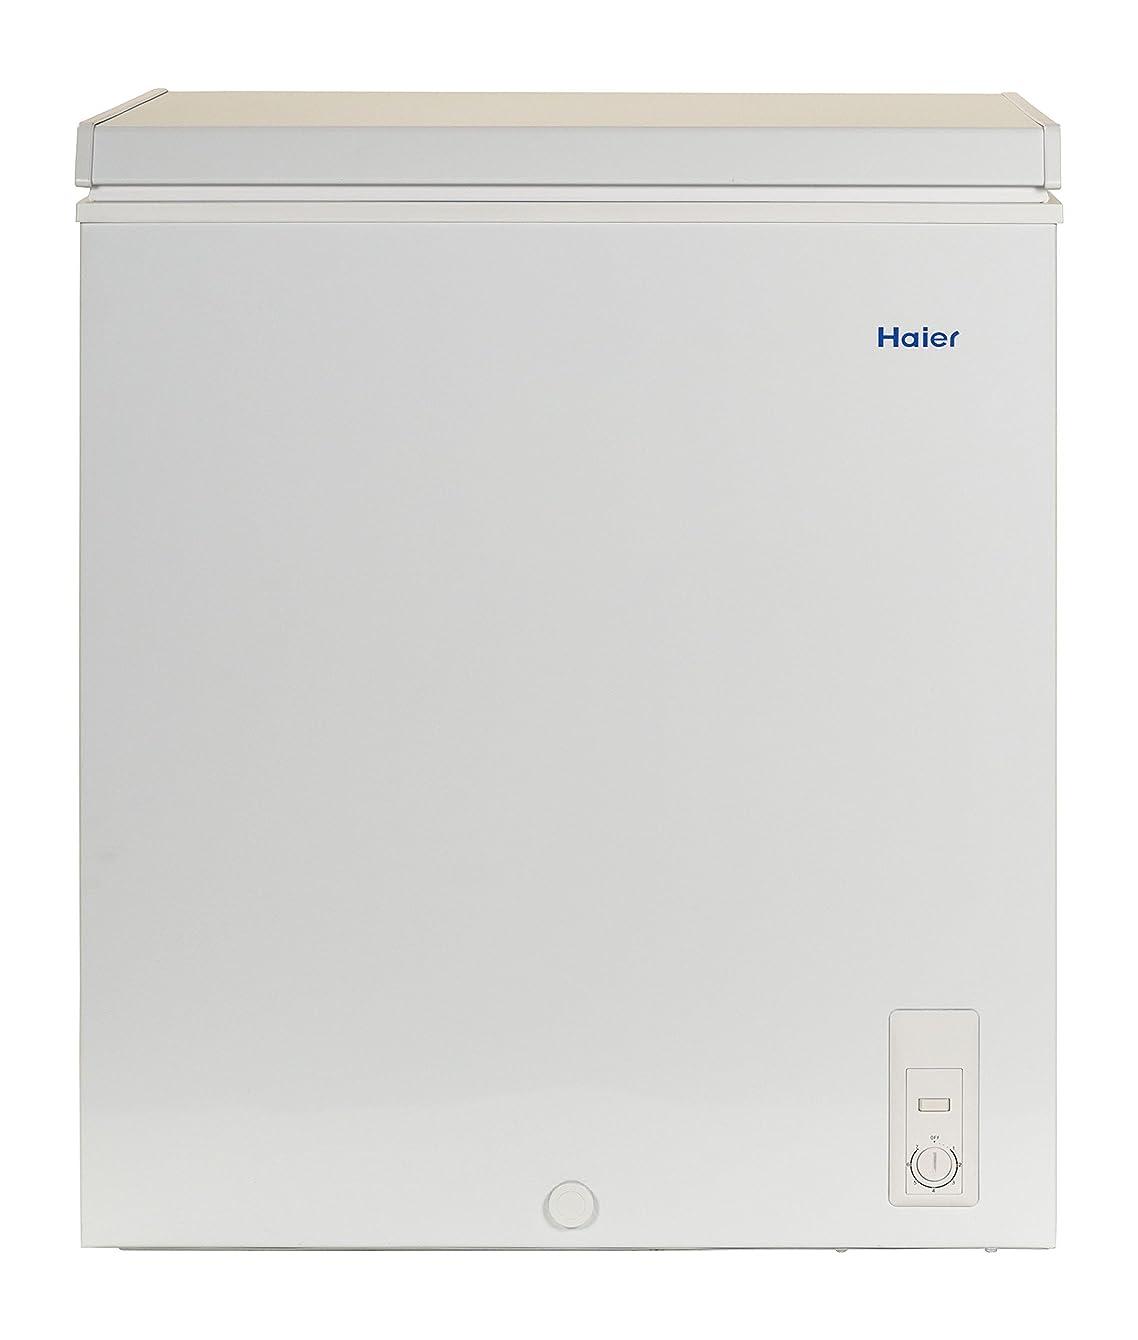 Haier HF50CM23NW 5.0 cu. ft. Capacity Chest Freezer, White